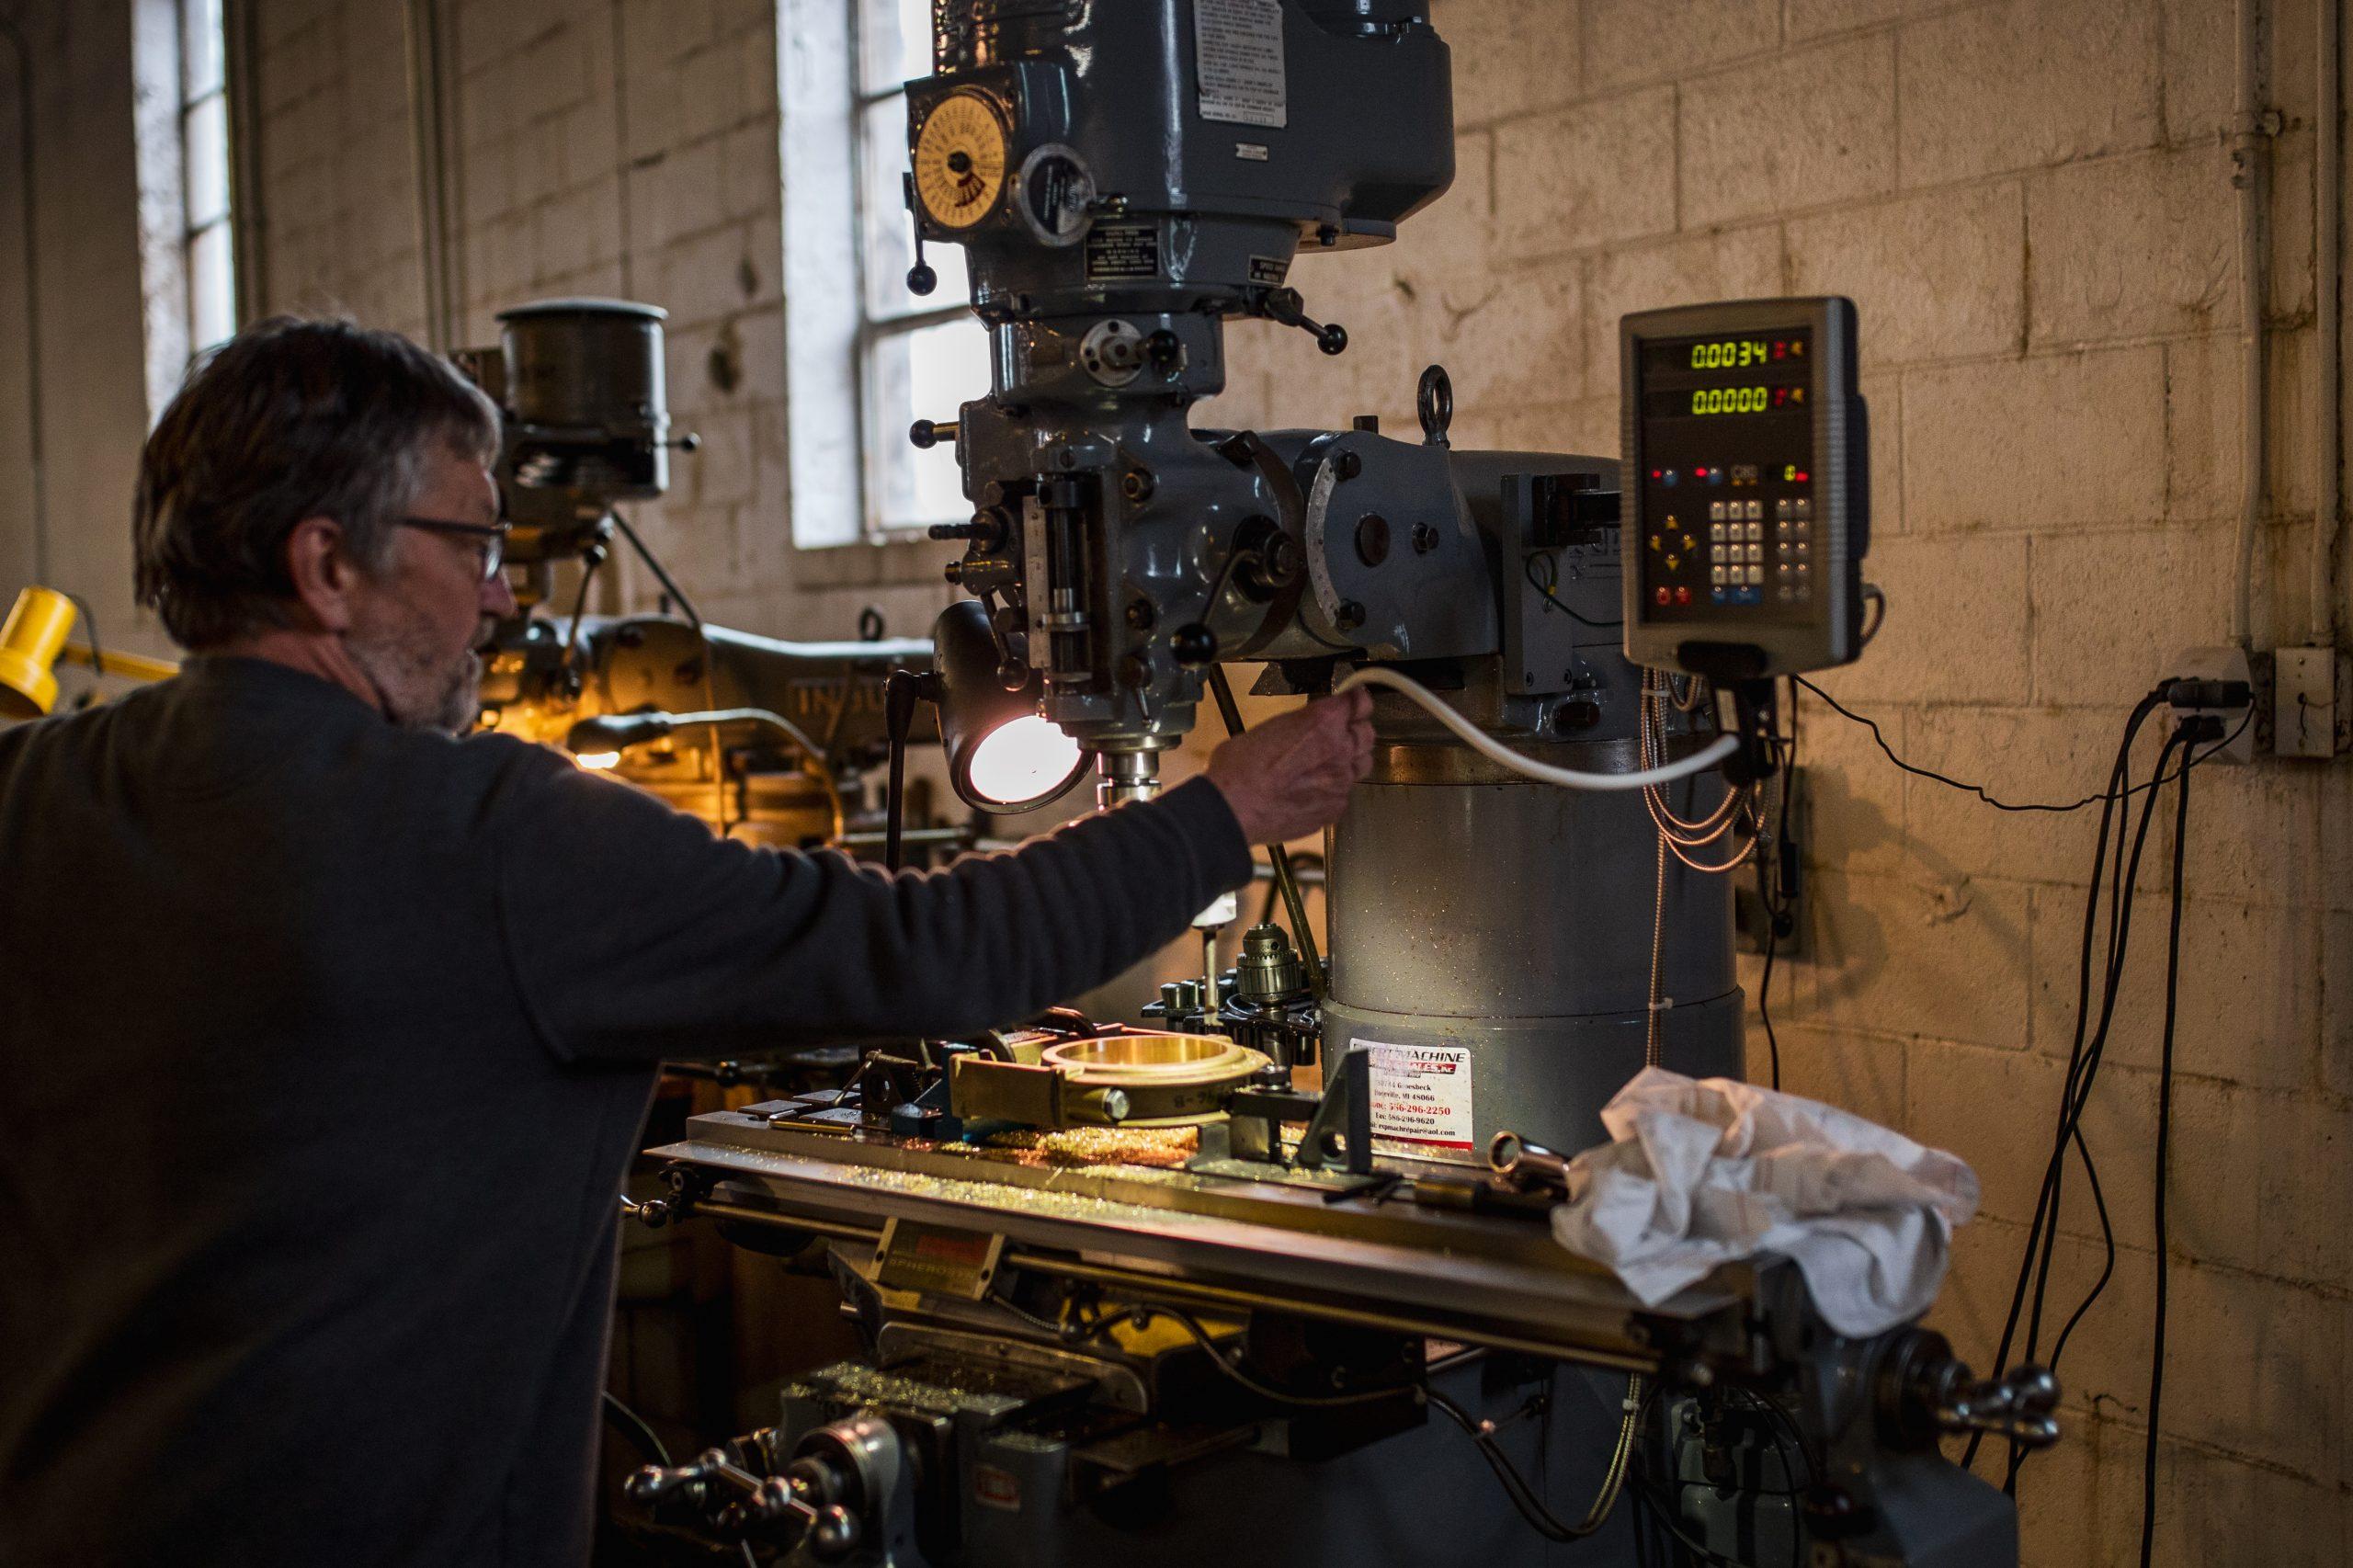 worker operating machinery